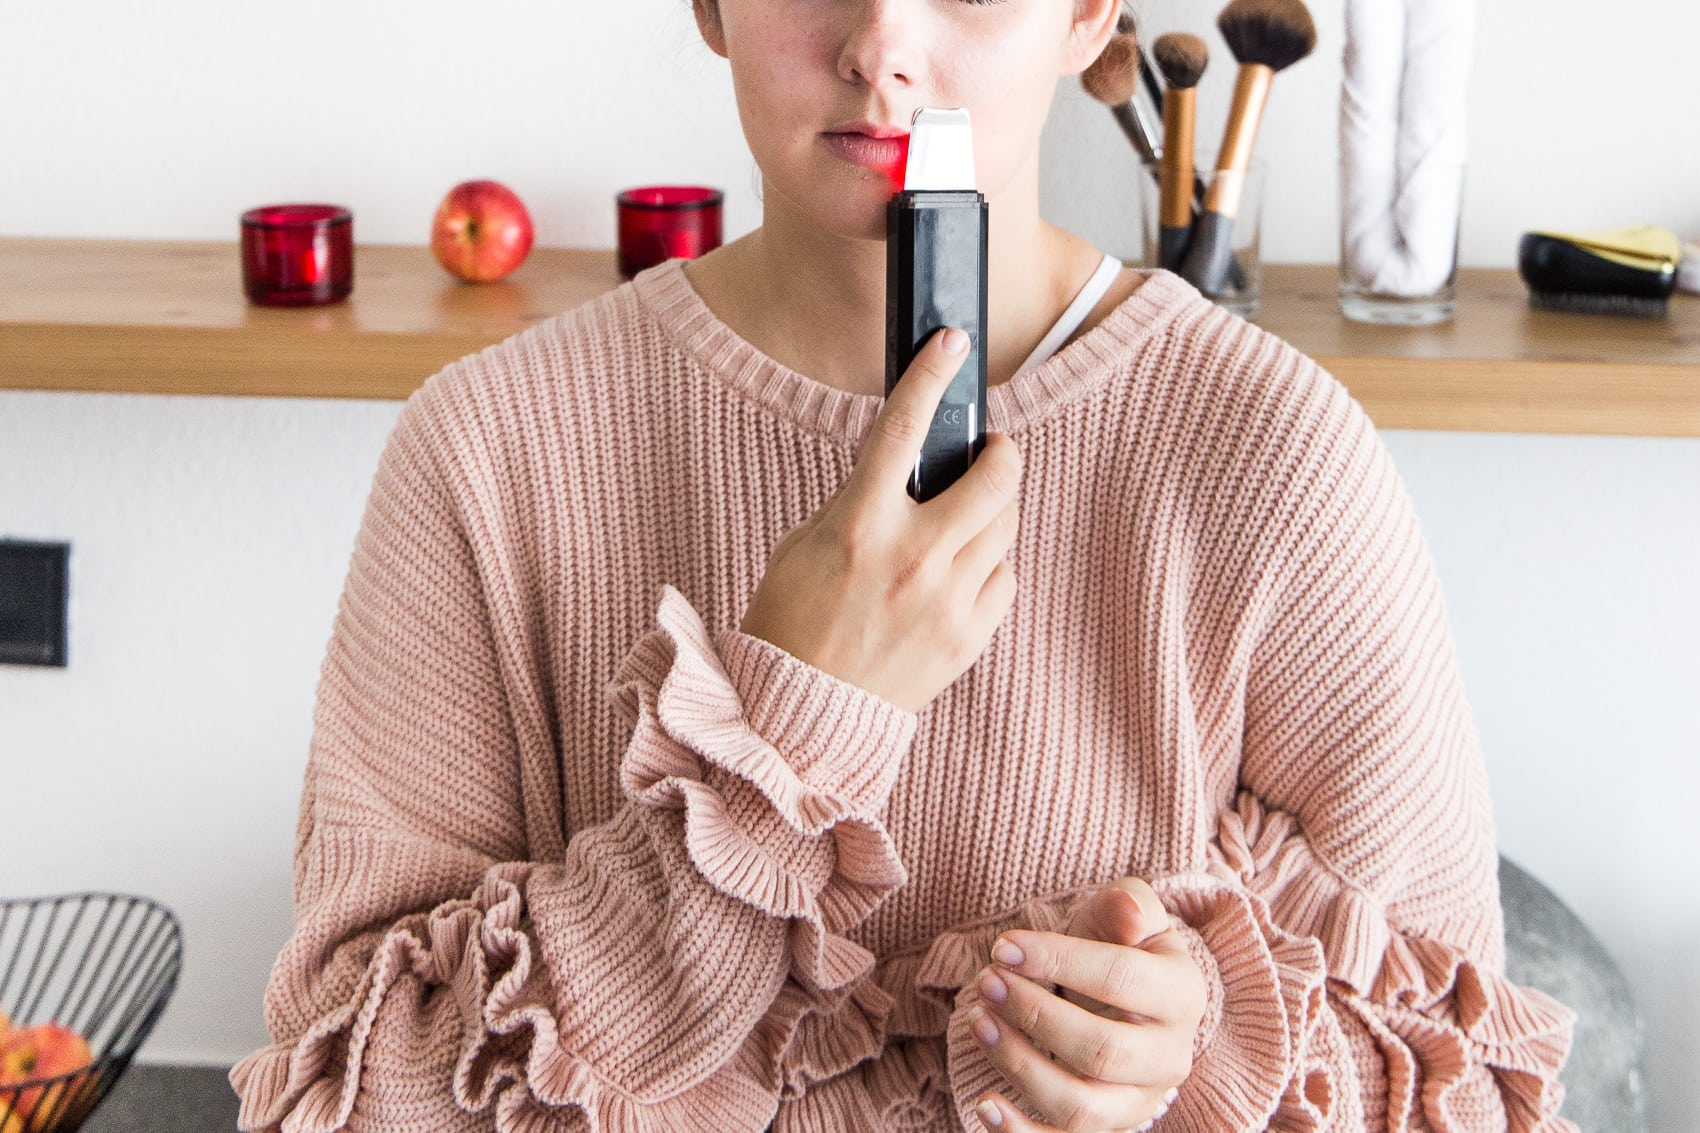 Kosmetikgeräte von Clubsante - La Belle Ultrasound Peeling Gerät im Test